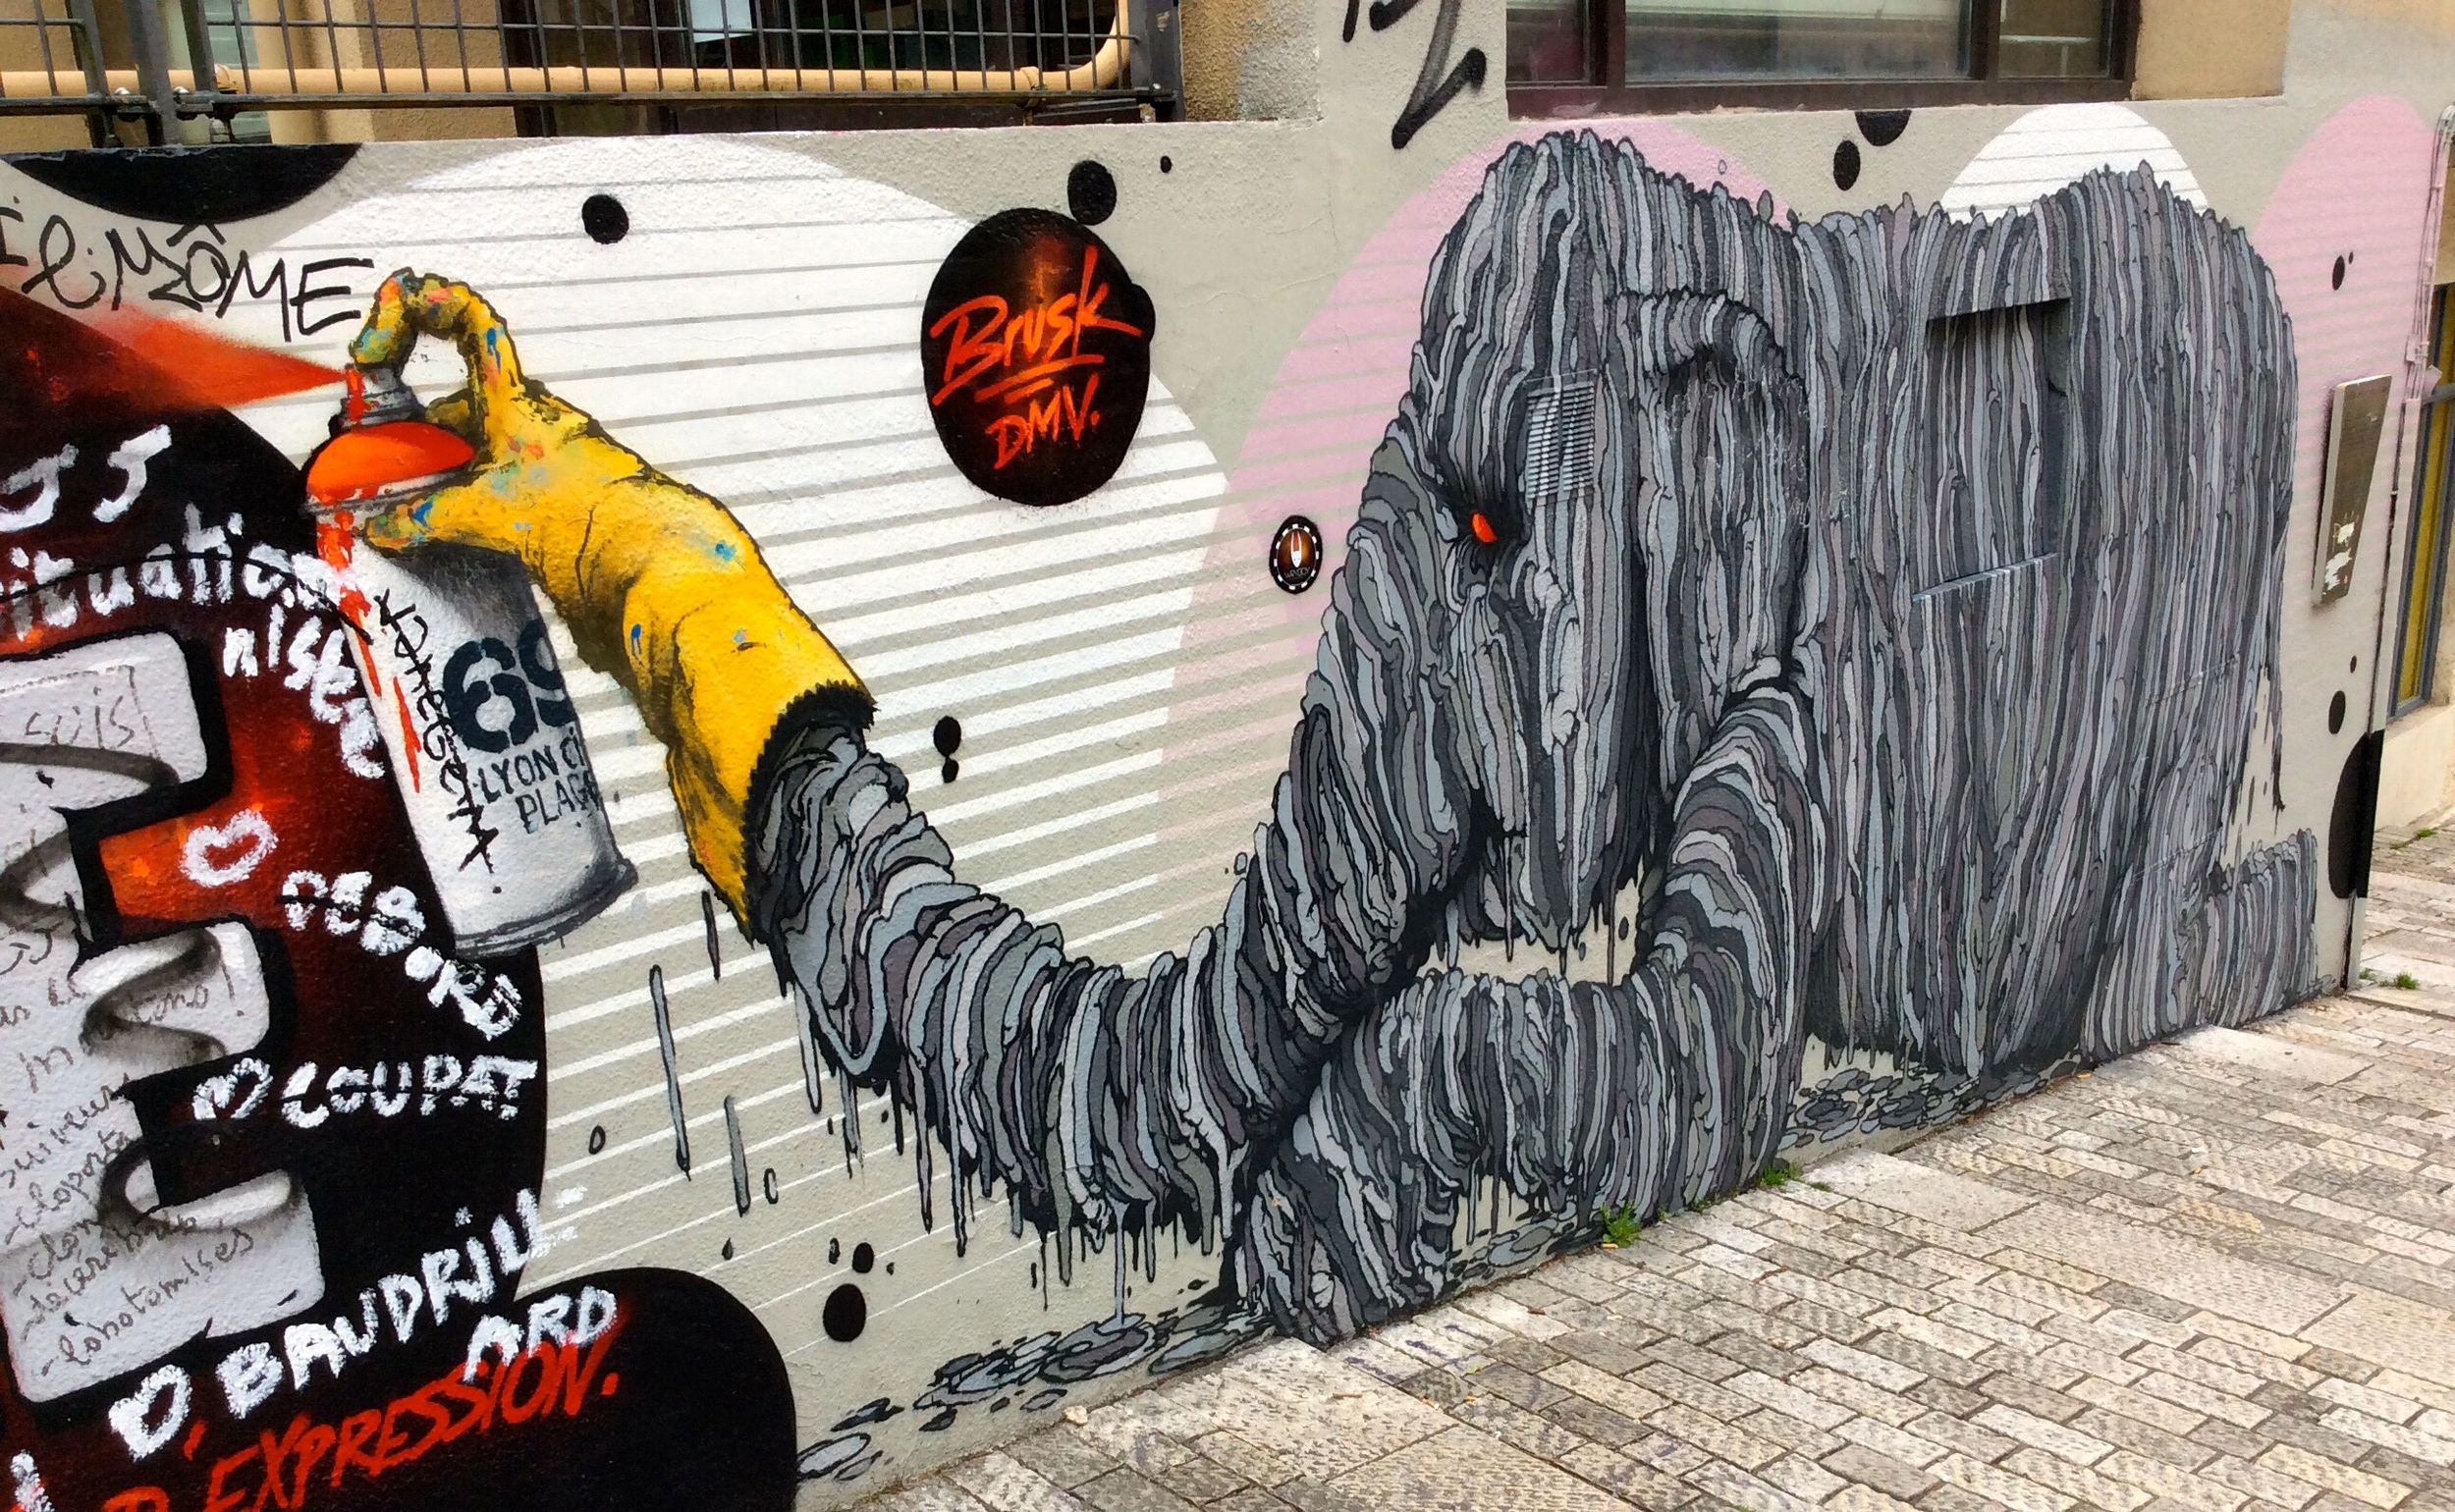 Graffiti in La Croix-Rousse